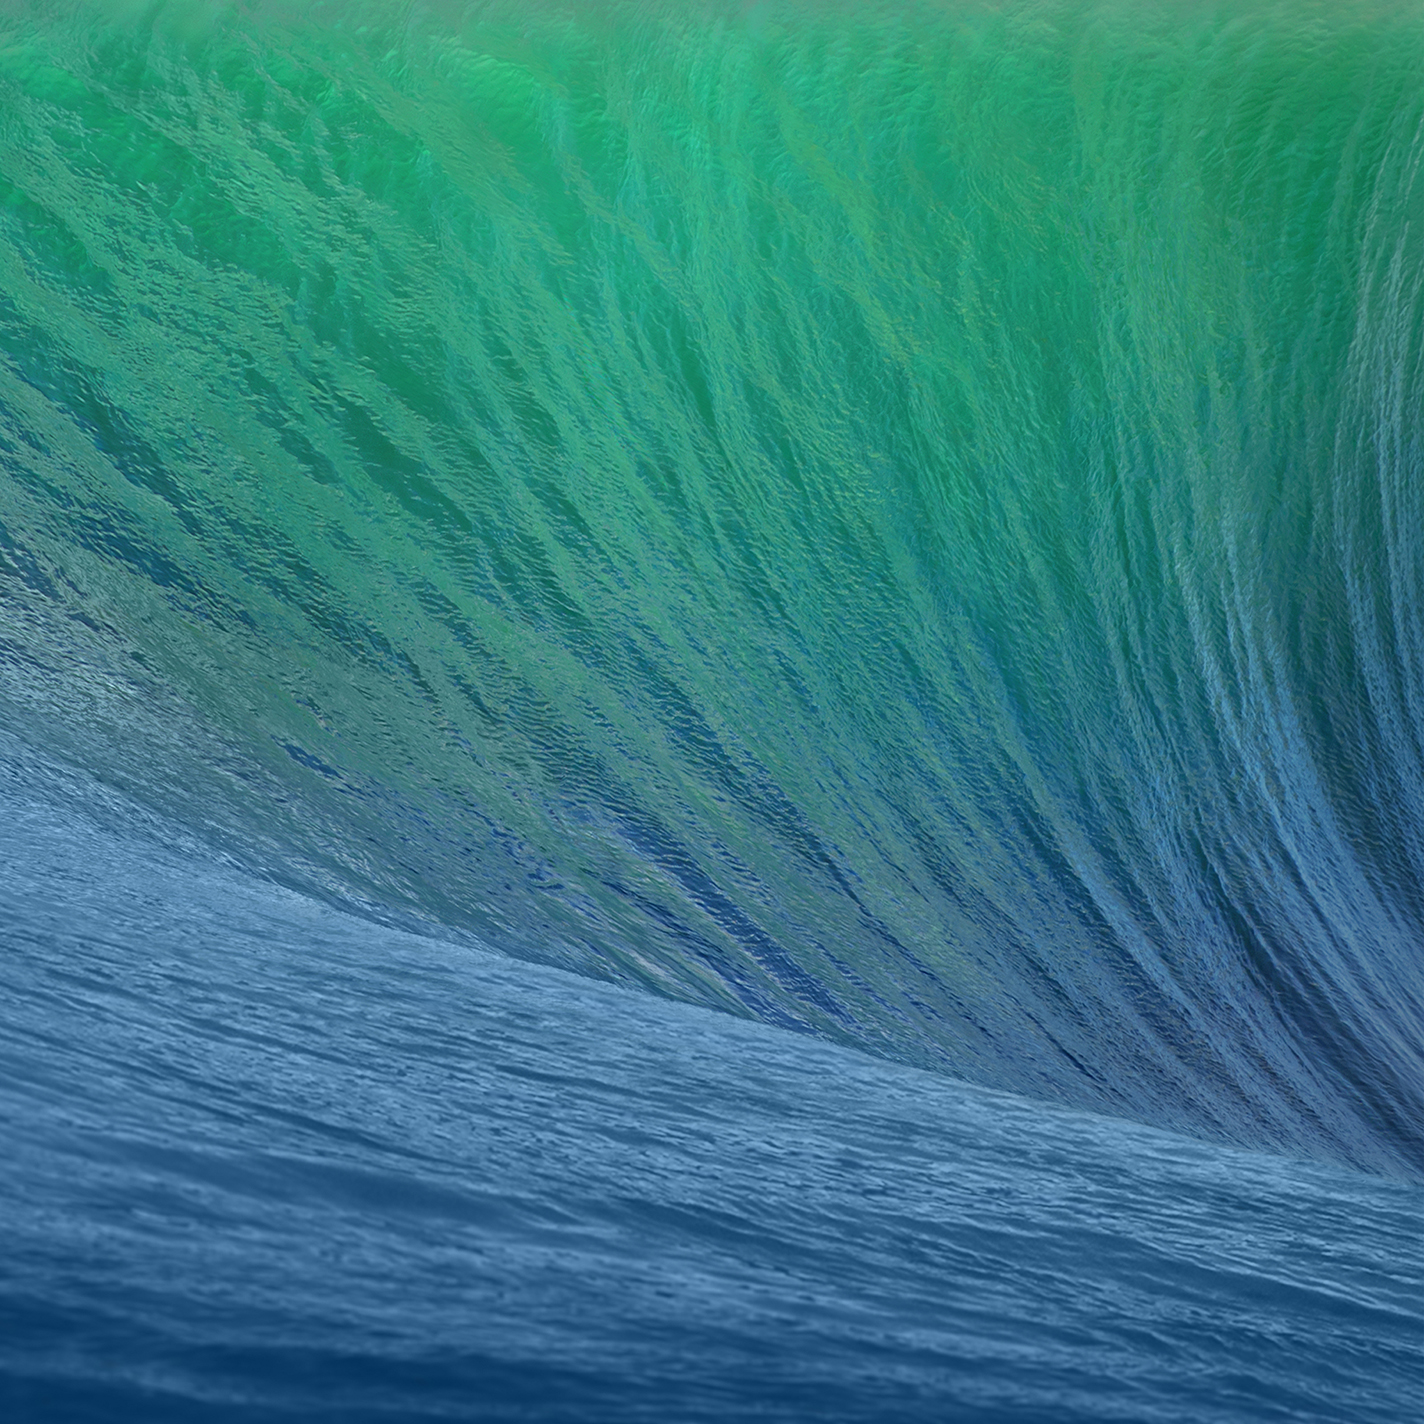 5k Os X Wallpaper: Mavericks HD Wallpaper